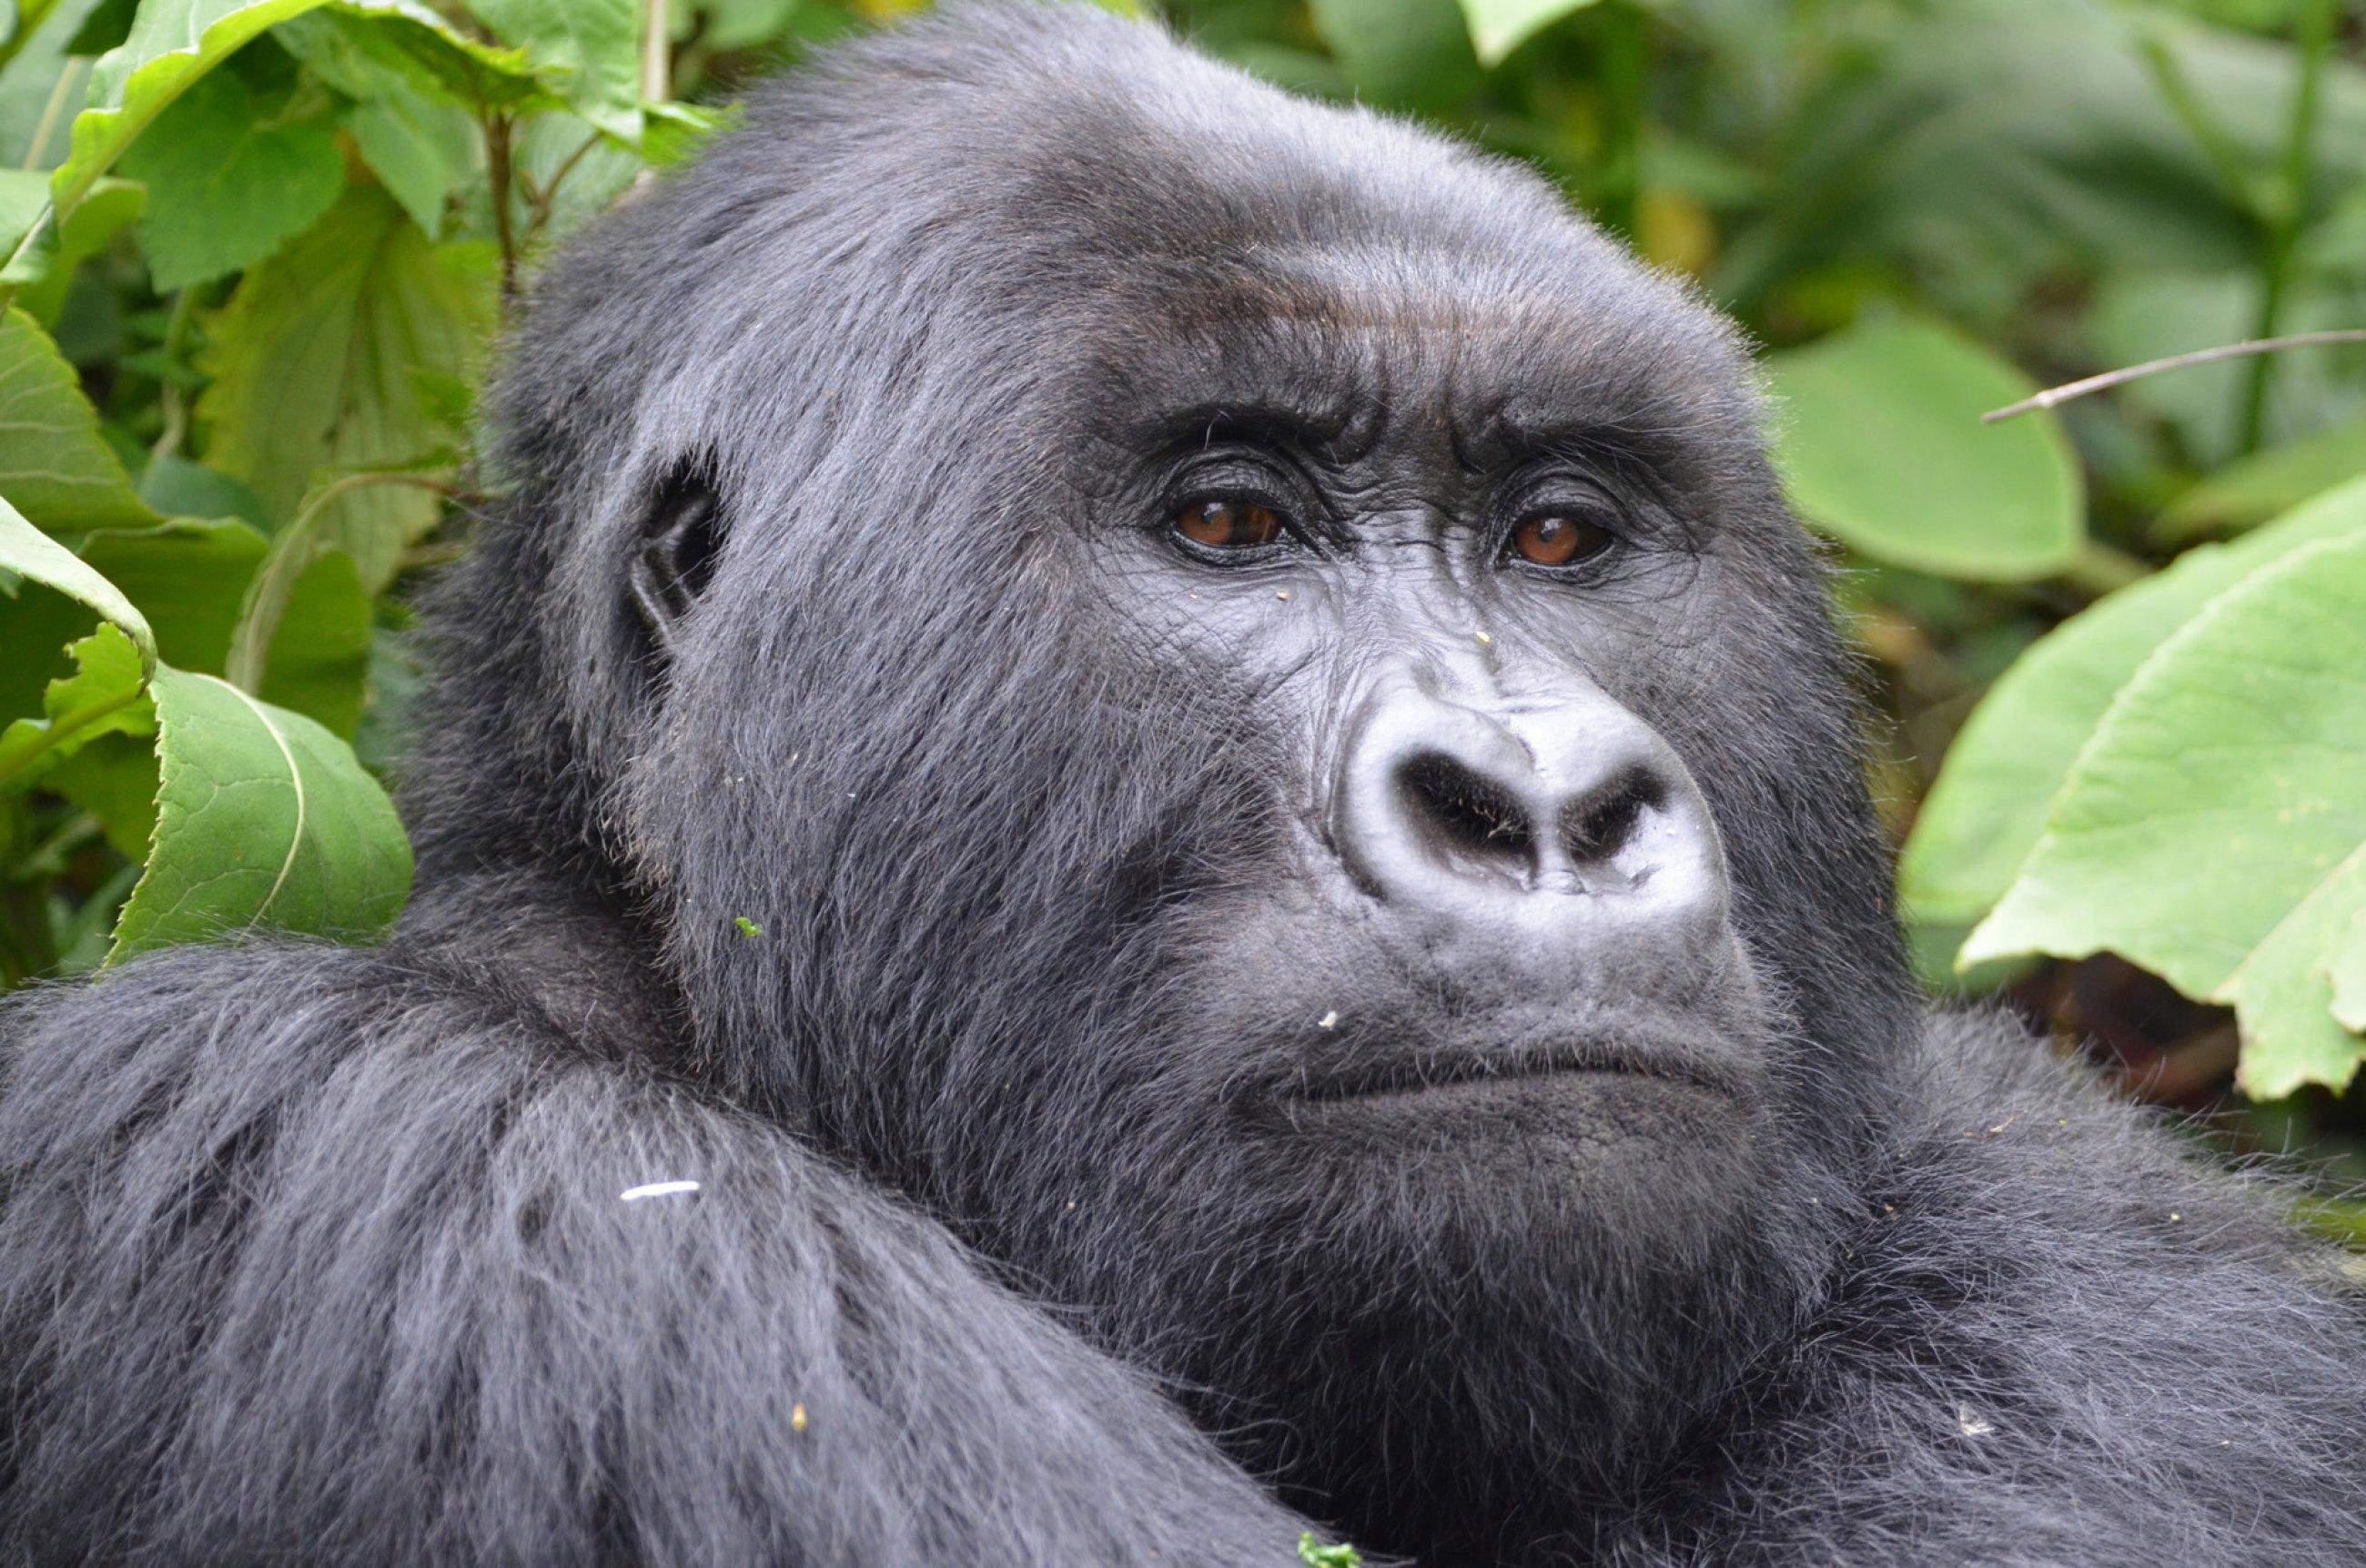 https://bubo.sk/uploads/galleries/4986/burundi-rwanda-uganda-kongo-martin-karnis-4032-2-.jpg